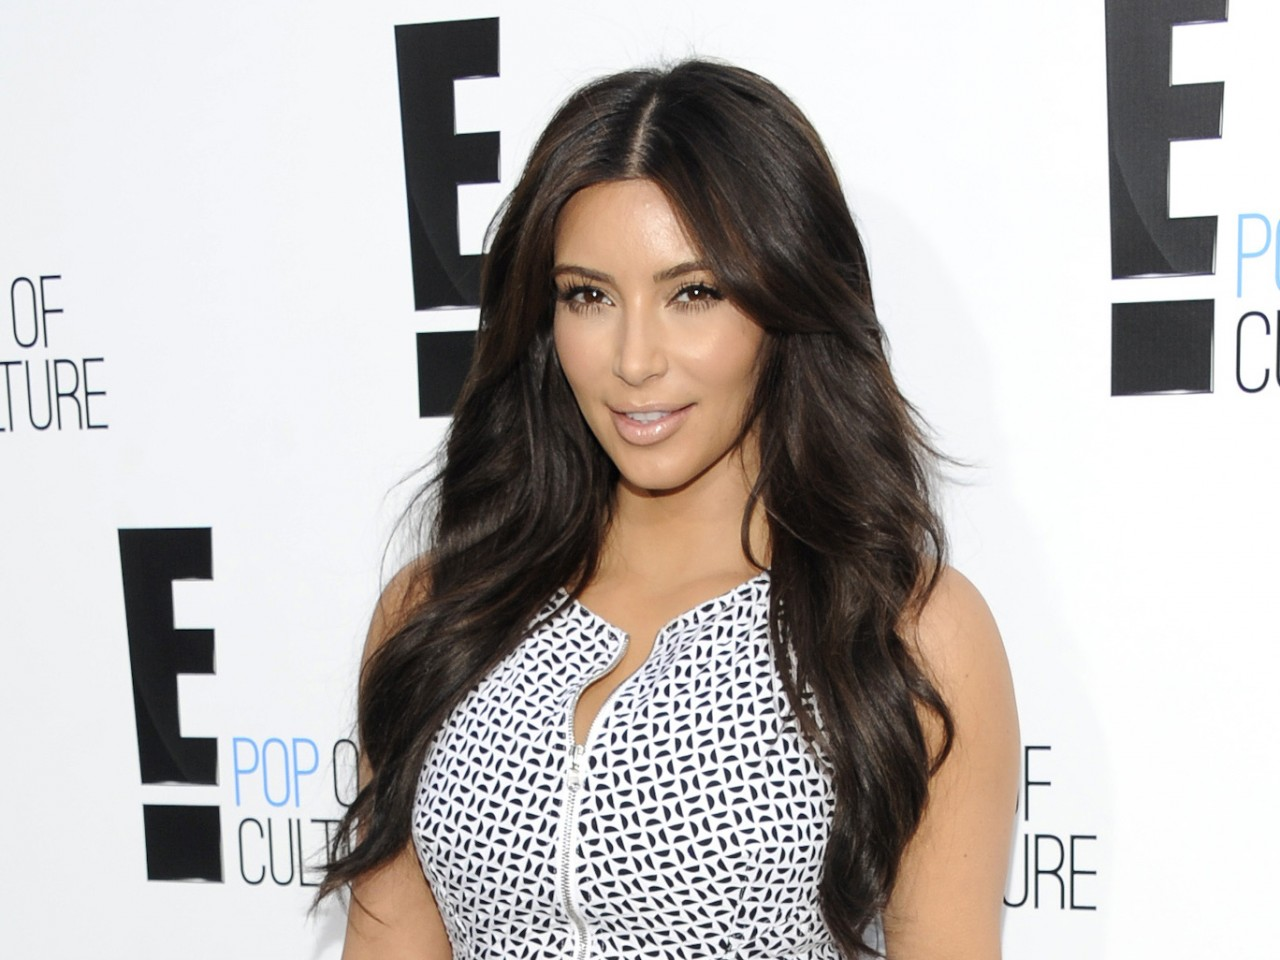 kim kardashian Wallpapers ImageBankbiz 1280x960